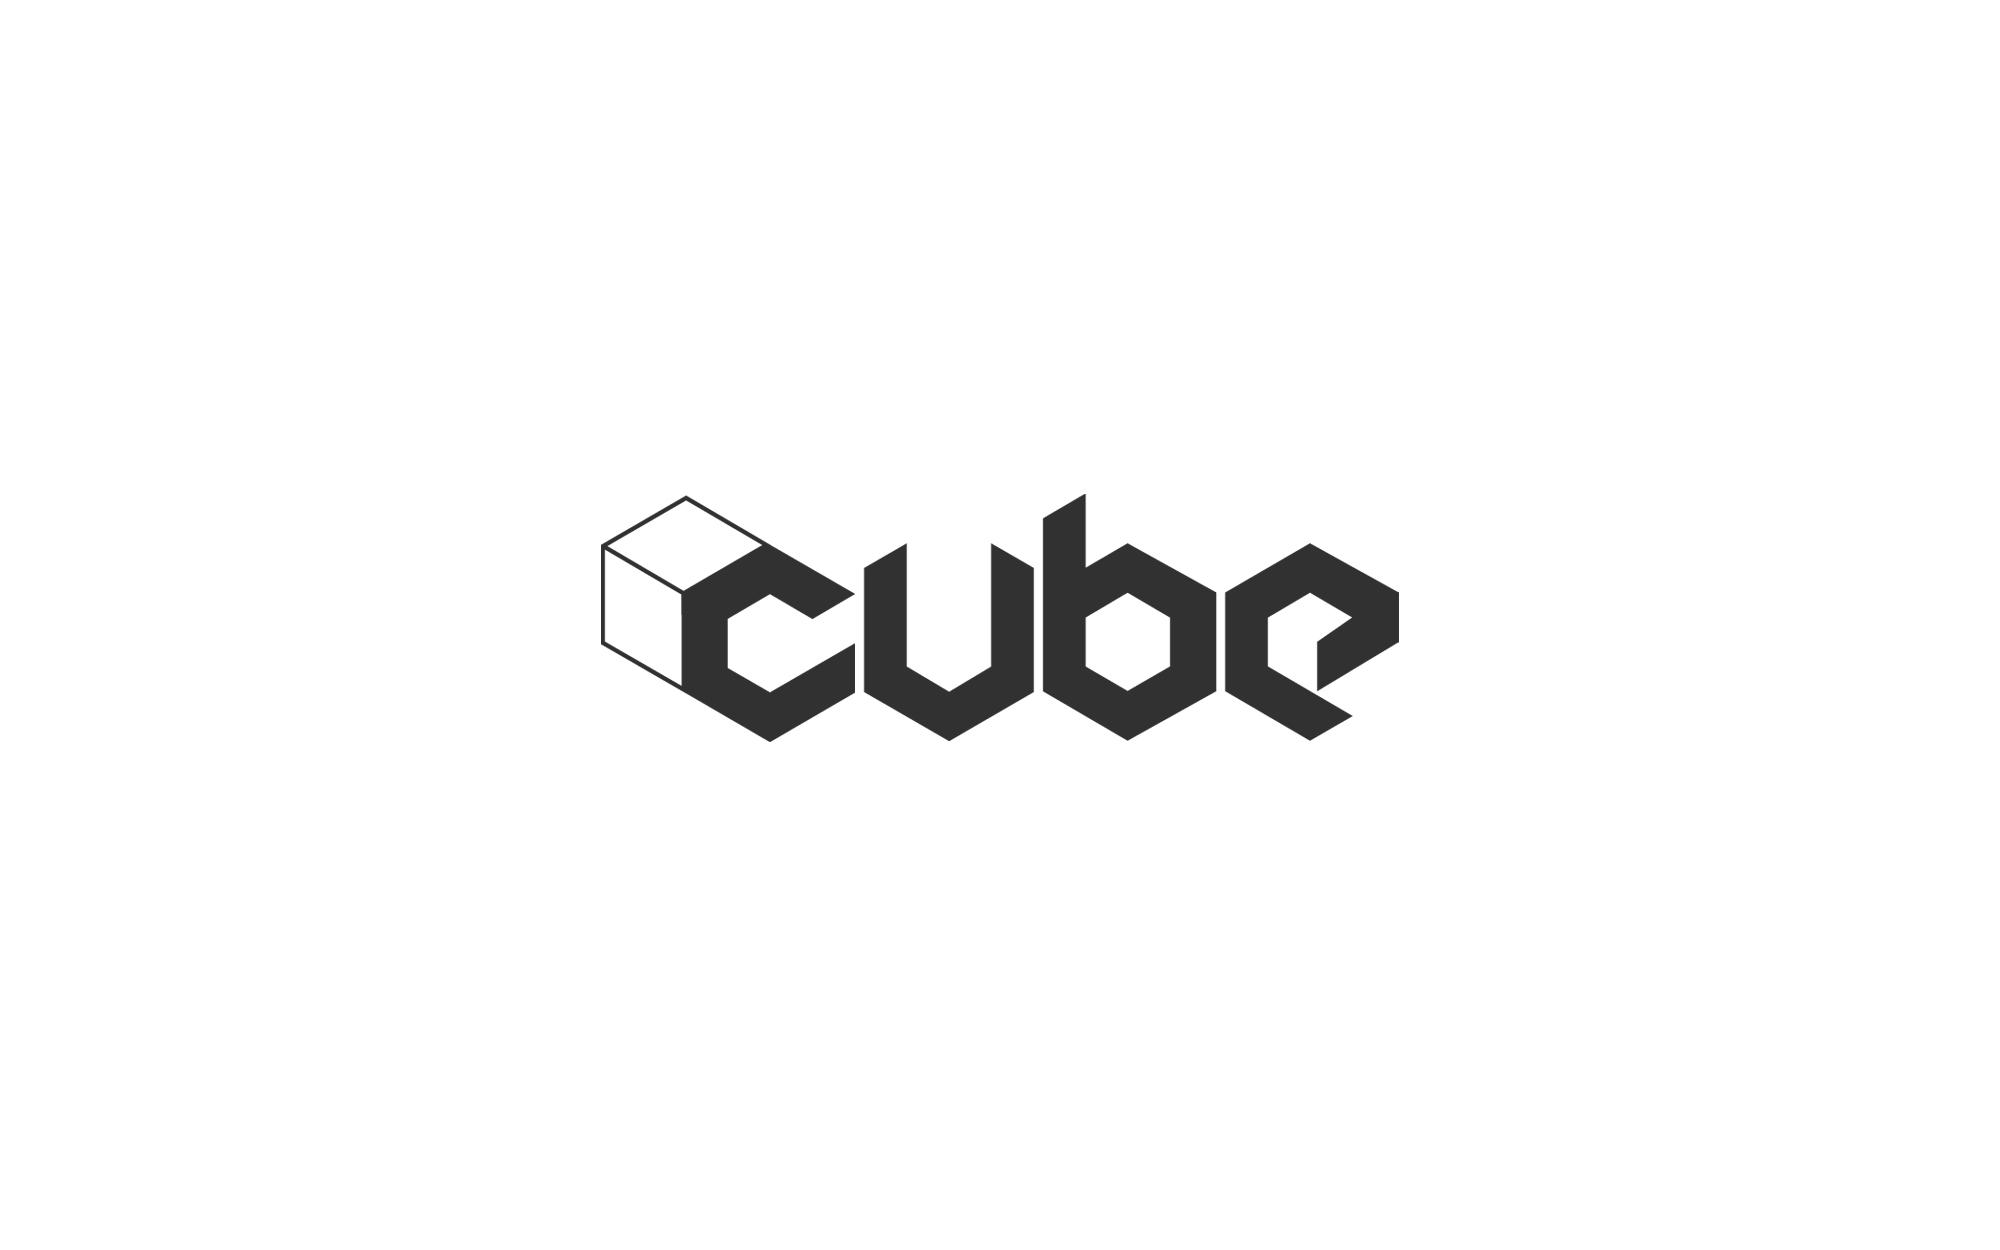 cube_logo_design_branding_matthew_pomorski_kent_graphic_design